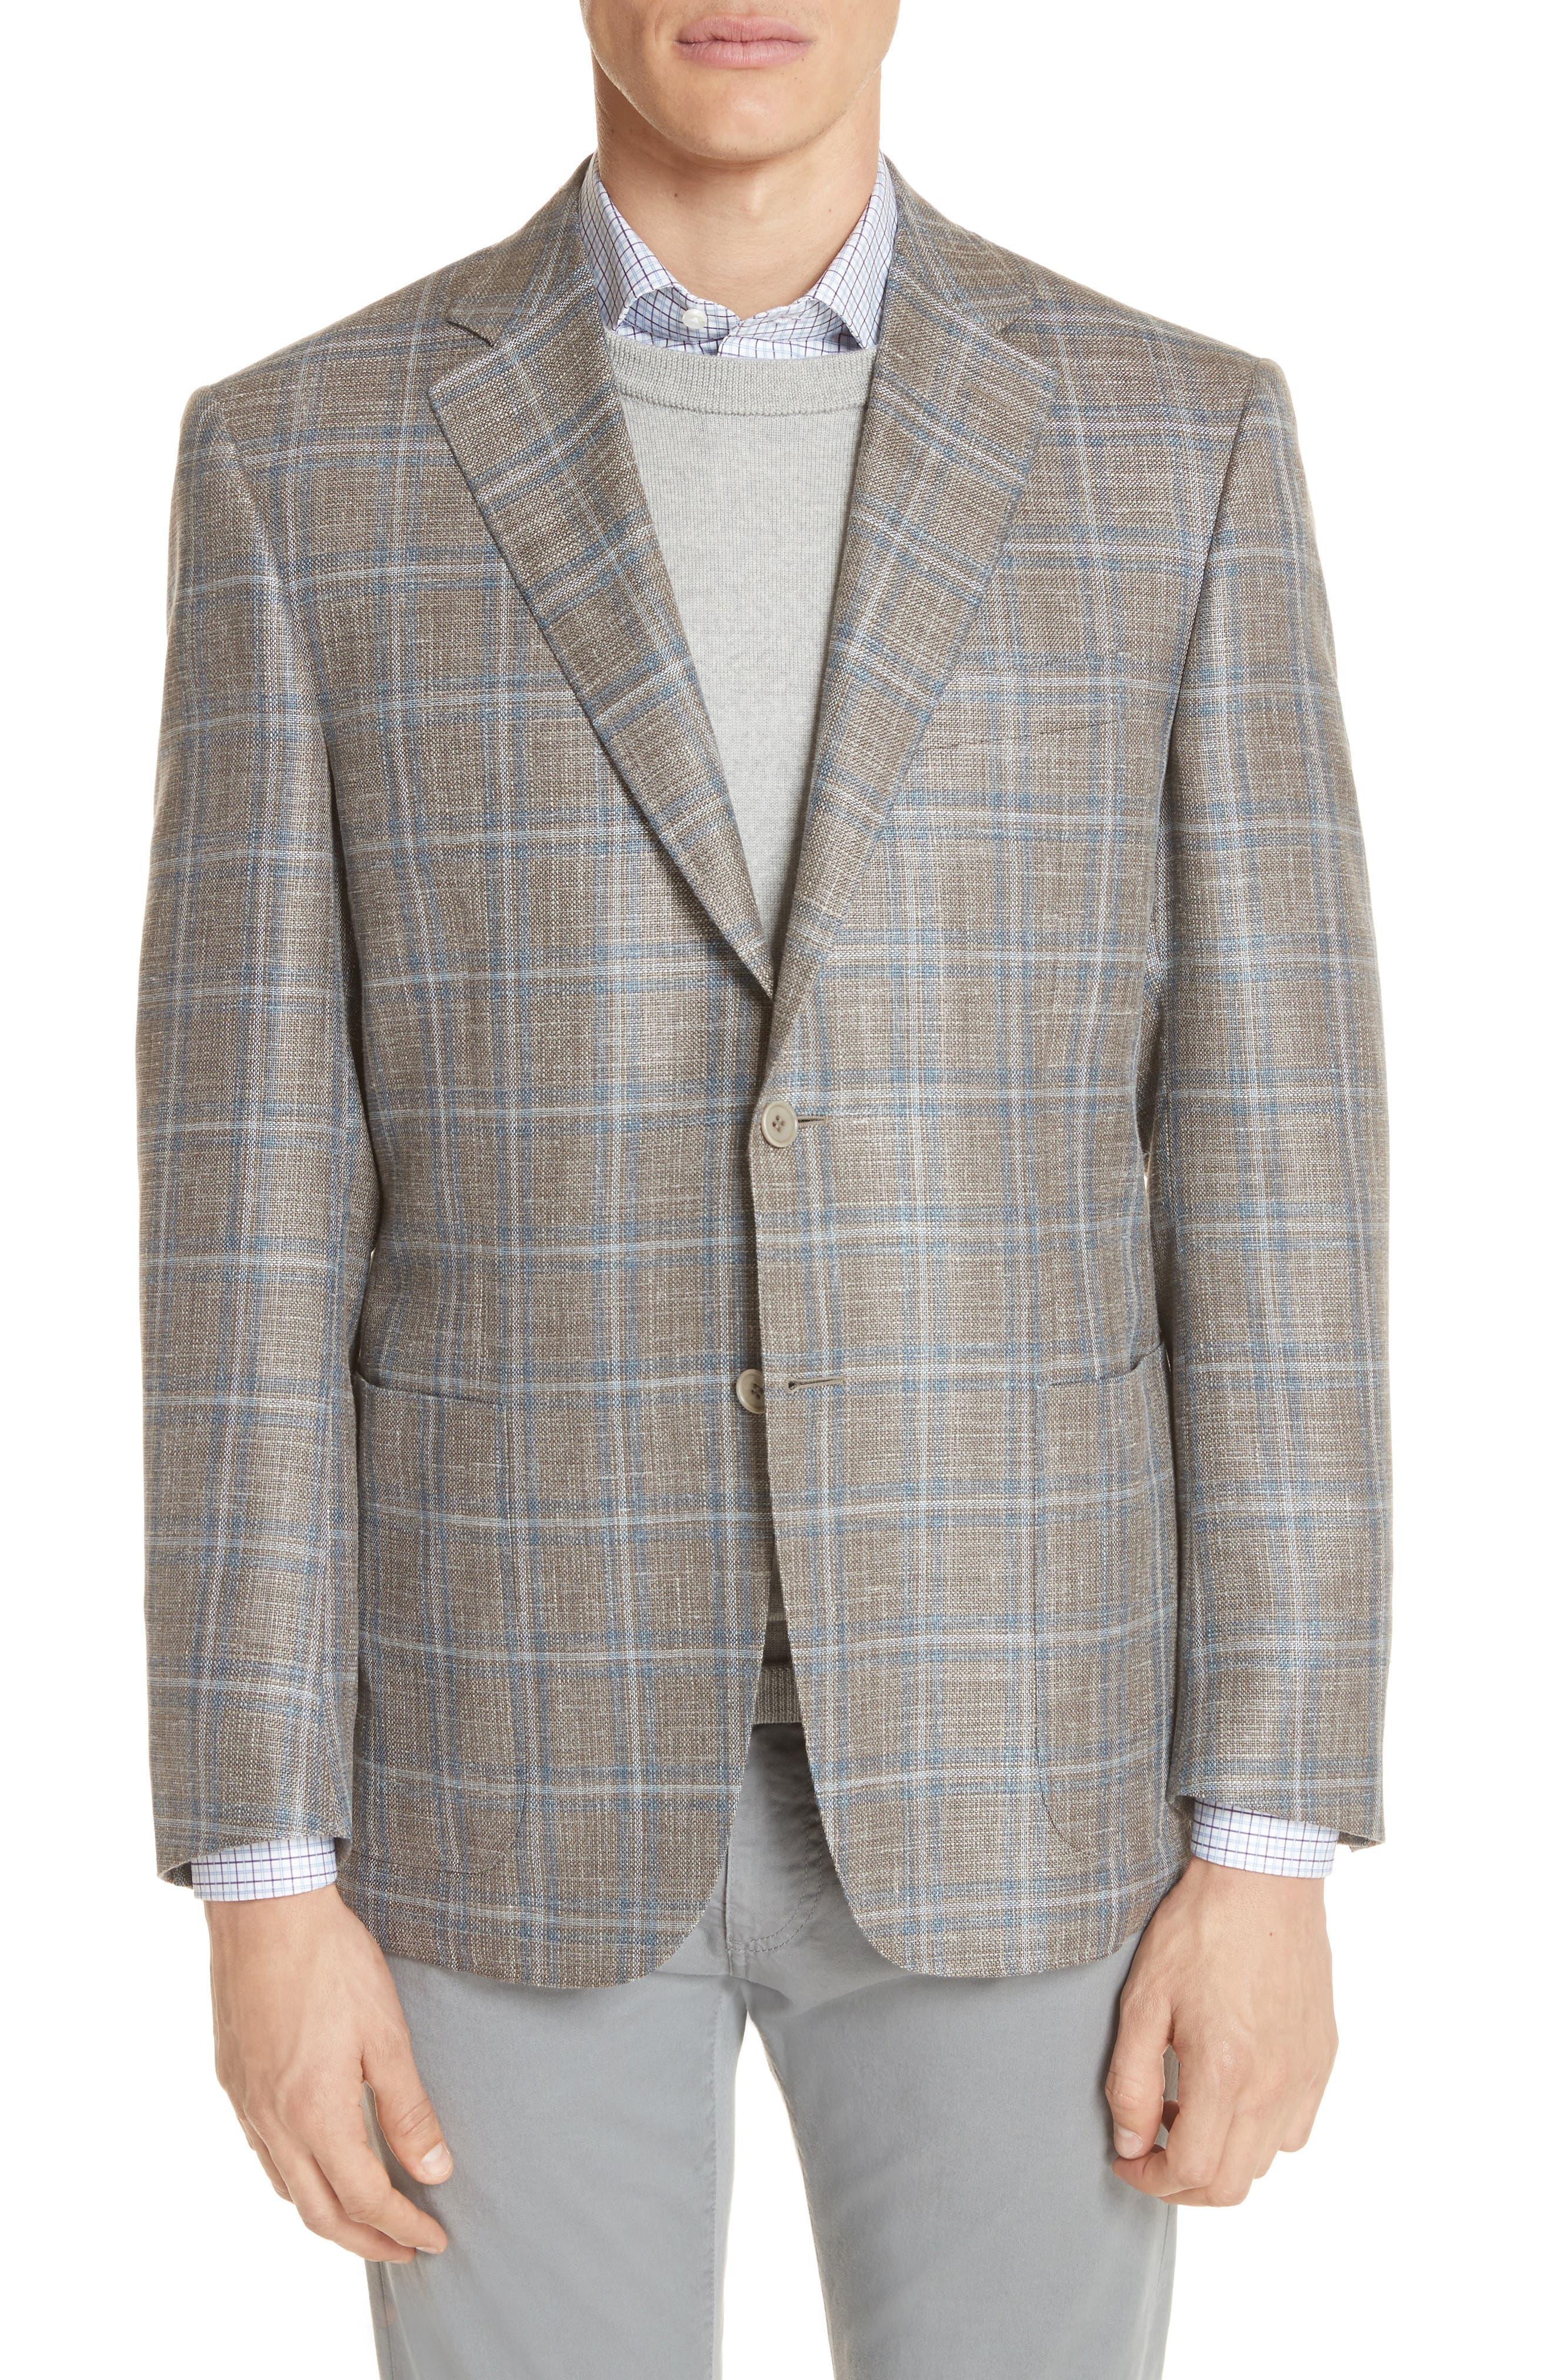 CANALI Kei Classic Fit Windowpane Wool Blend Sport Coat, Main, color, 250